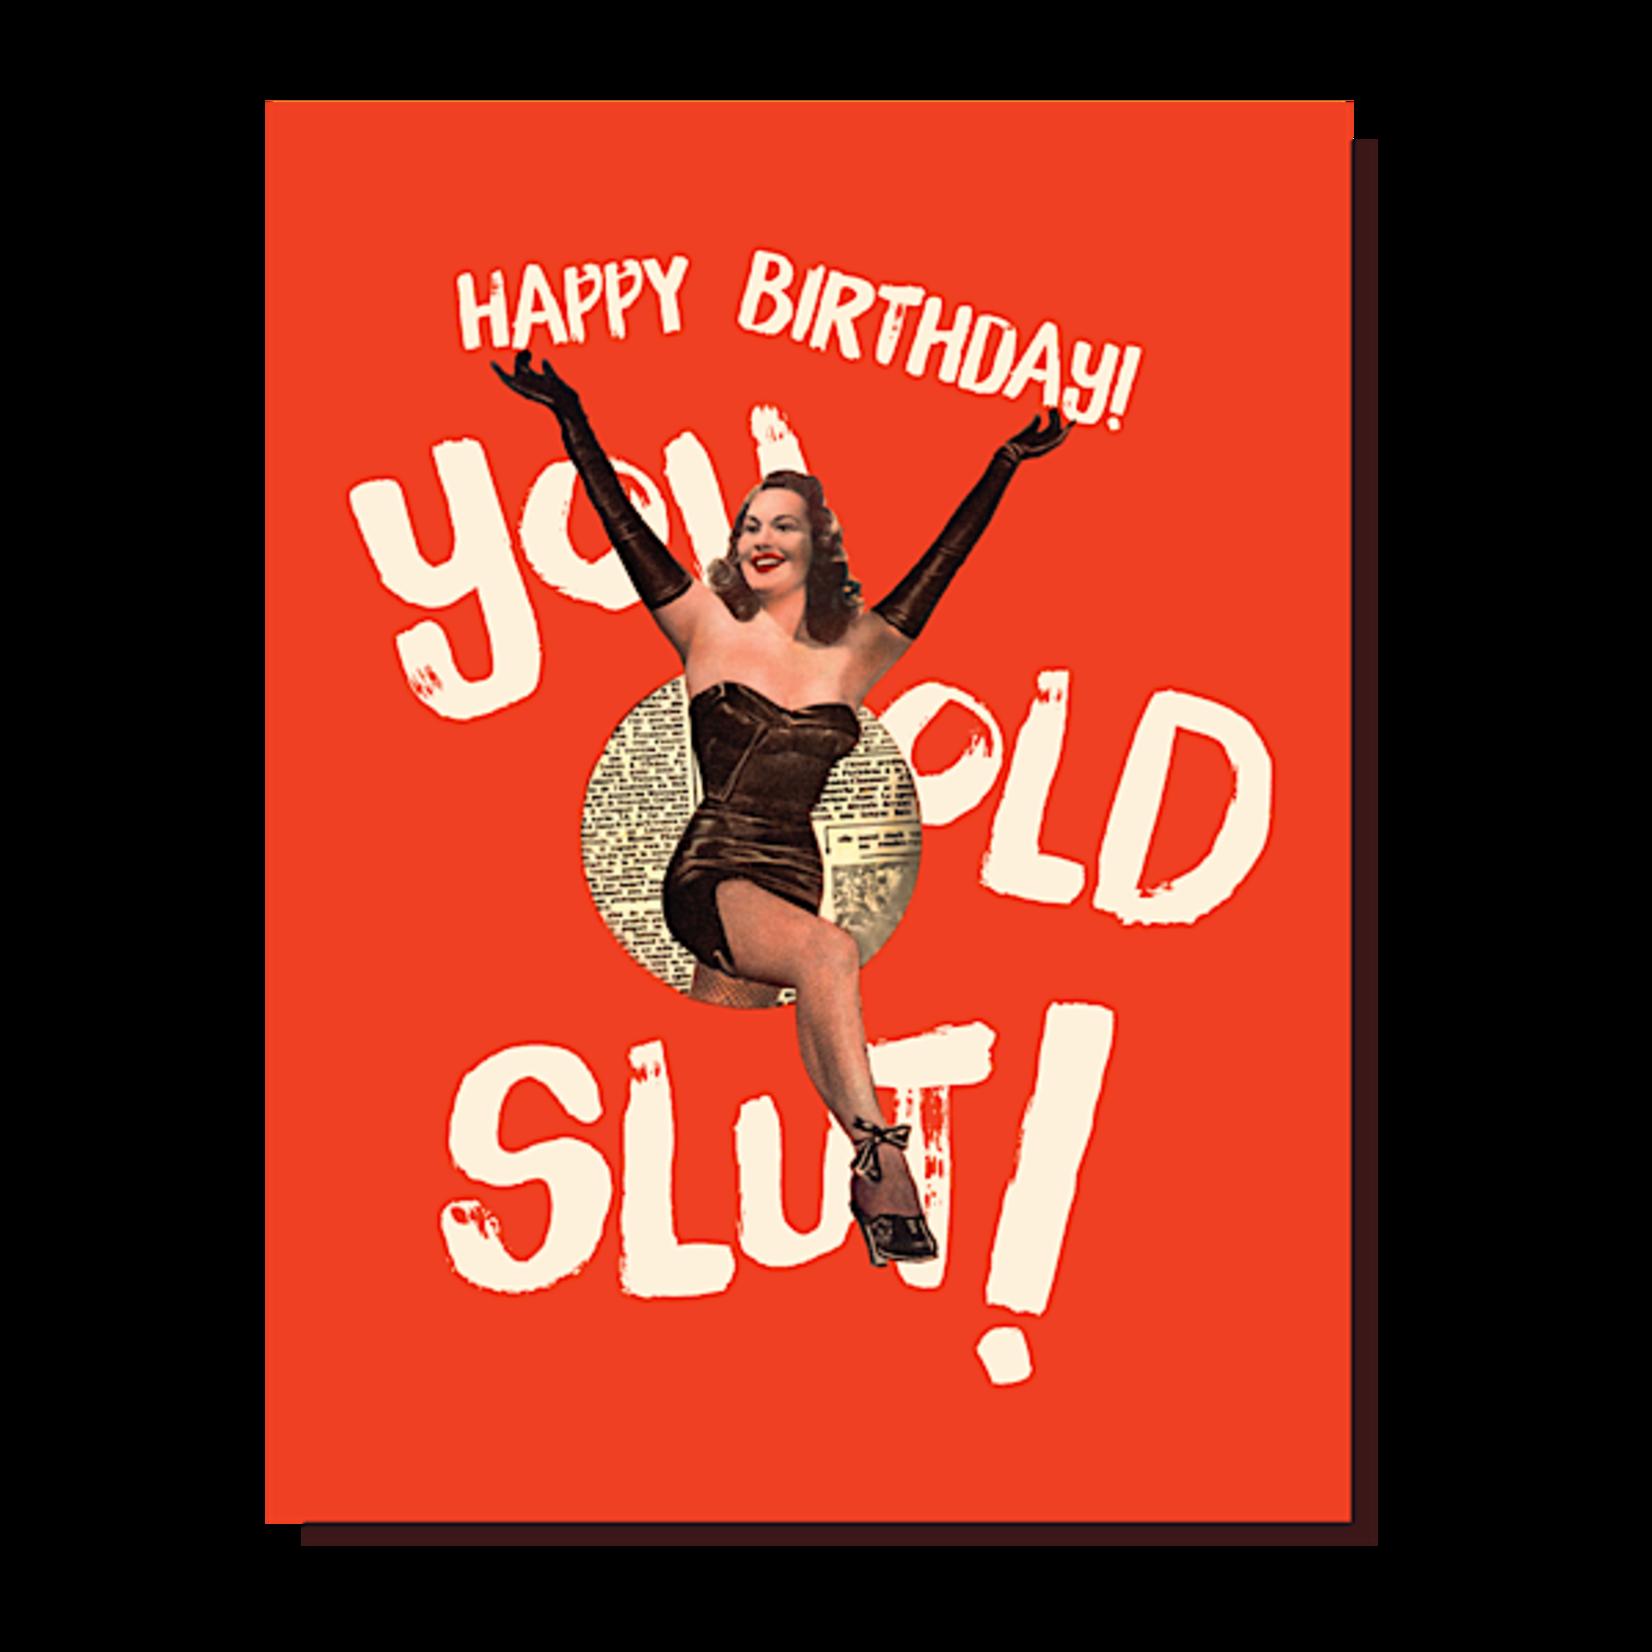 Card - Happy Birthday You Old Slut